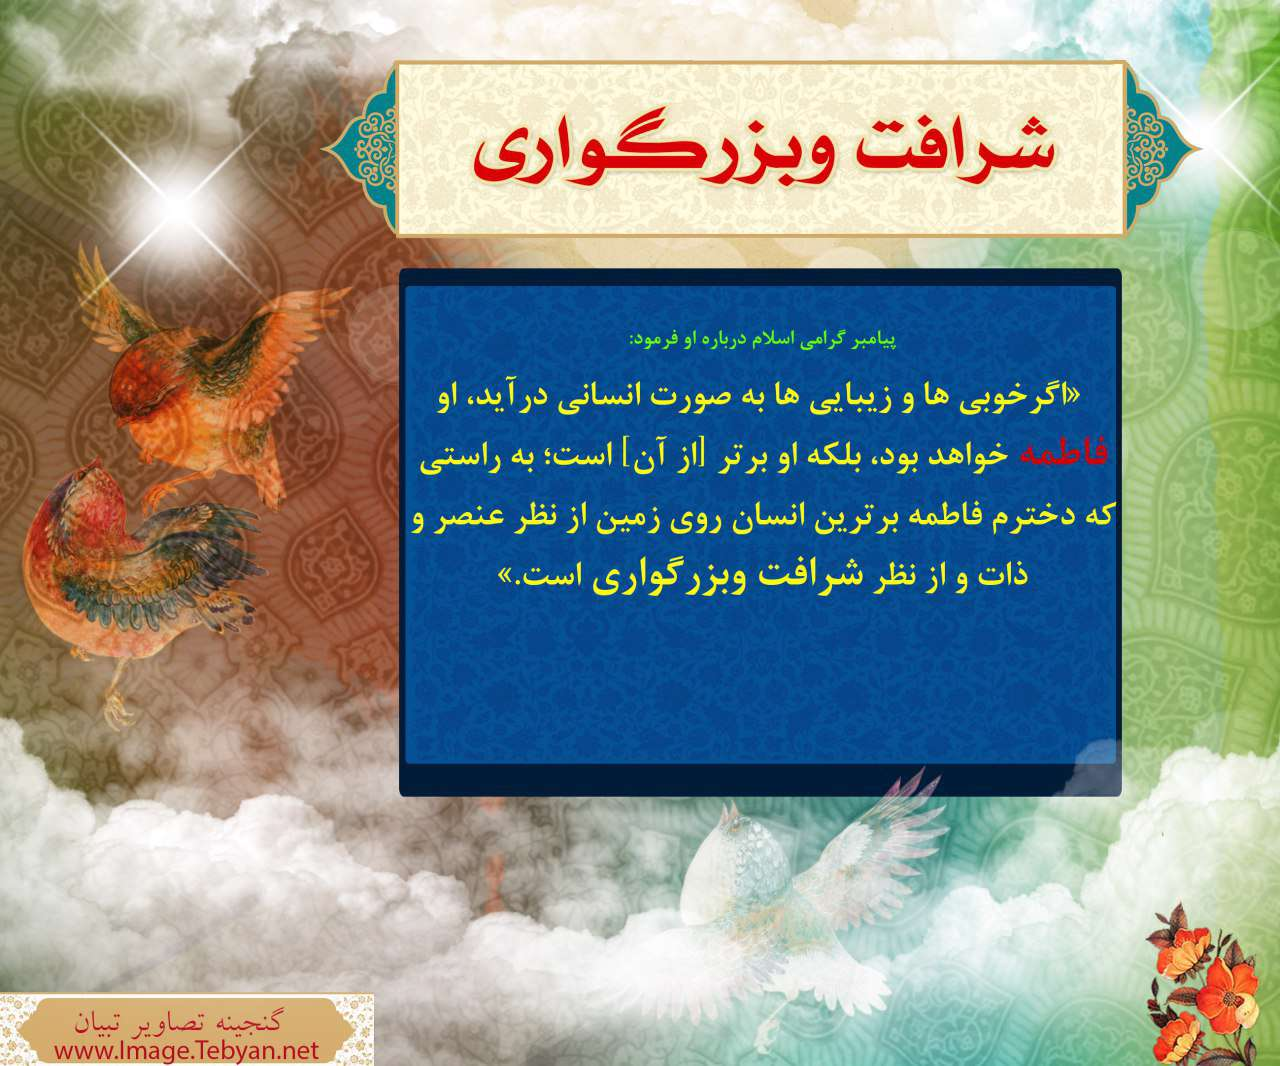 شرافت و بزرگواری حضرت زهرا  سلام الله علیها